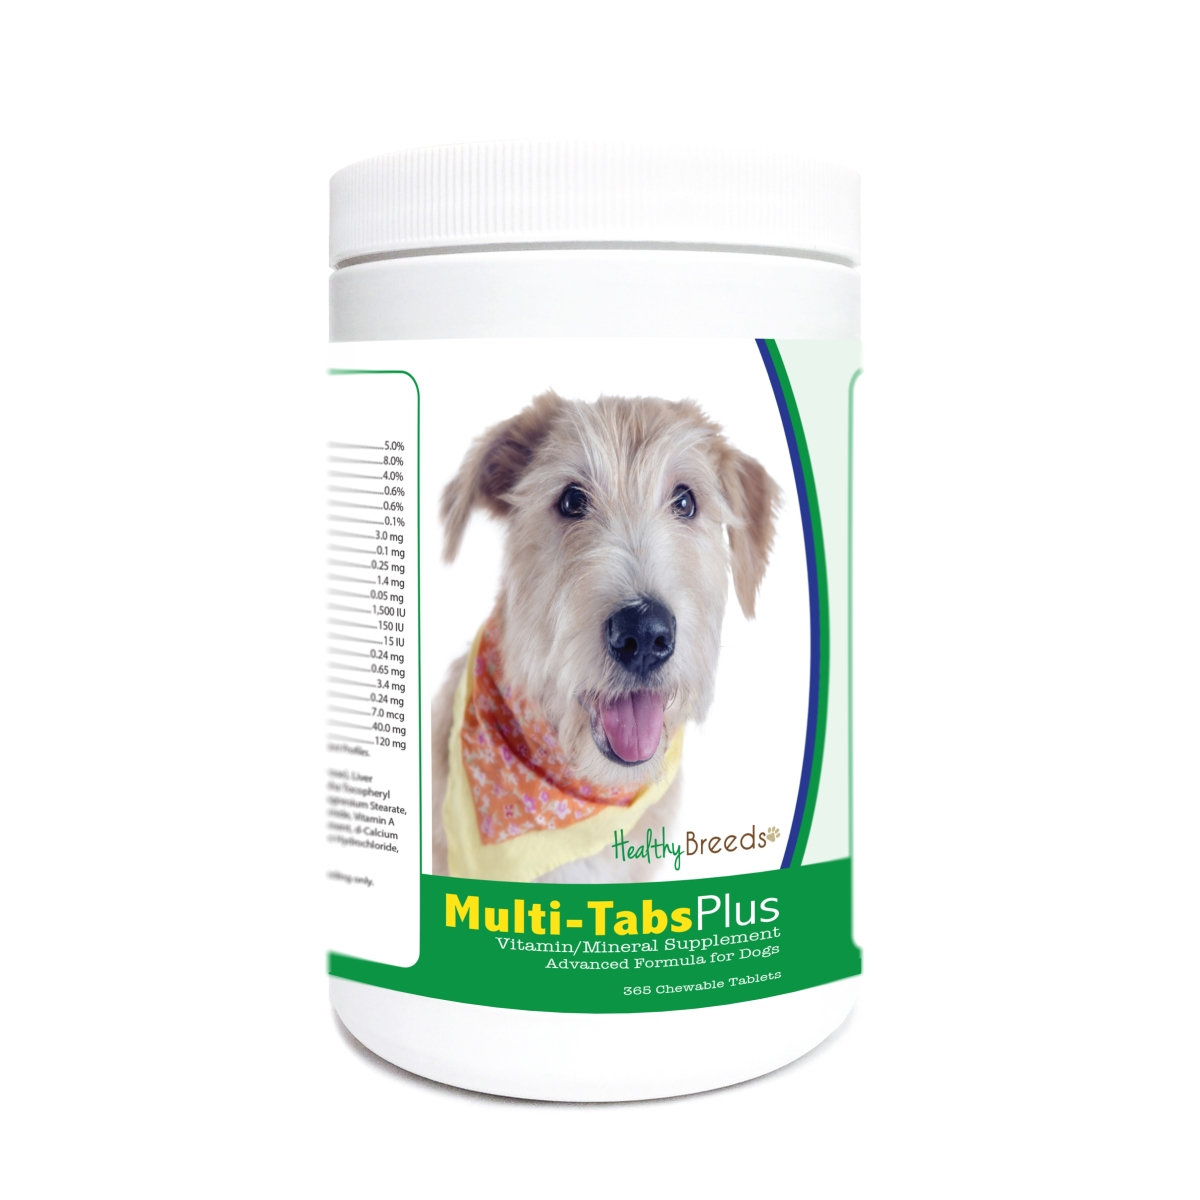 Healthy Breeds 840235181842 Glen of Imaal Terrier Multi-Tabs Plus Chewable Tablets - 365 Count